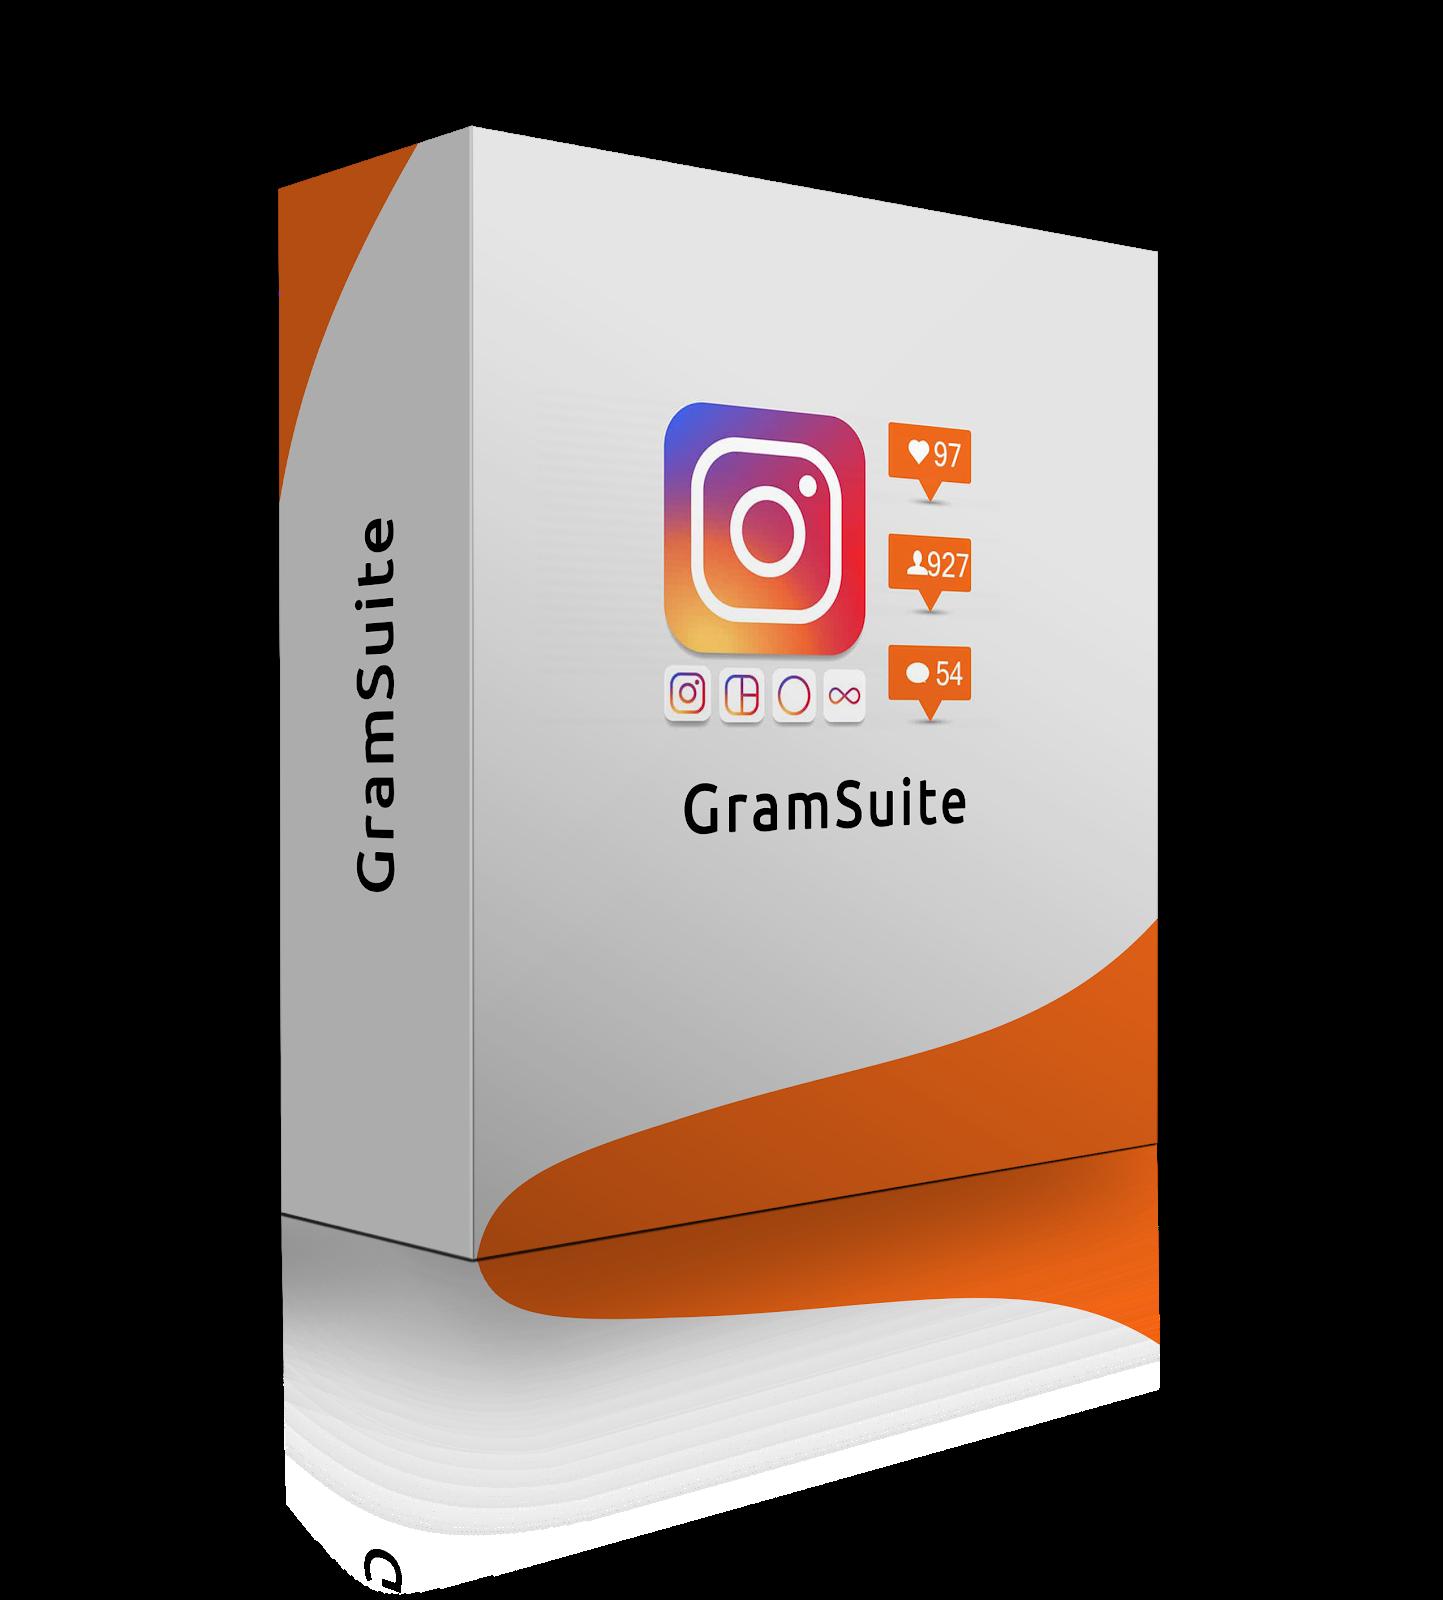 GramSuite